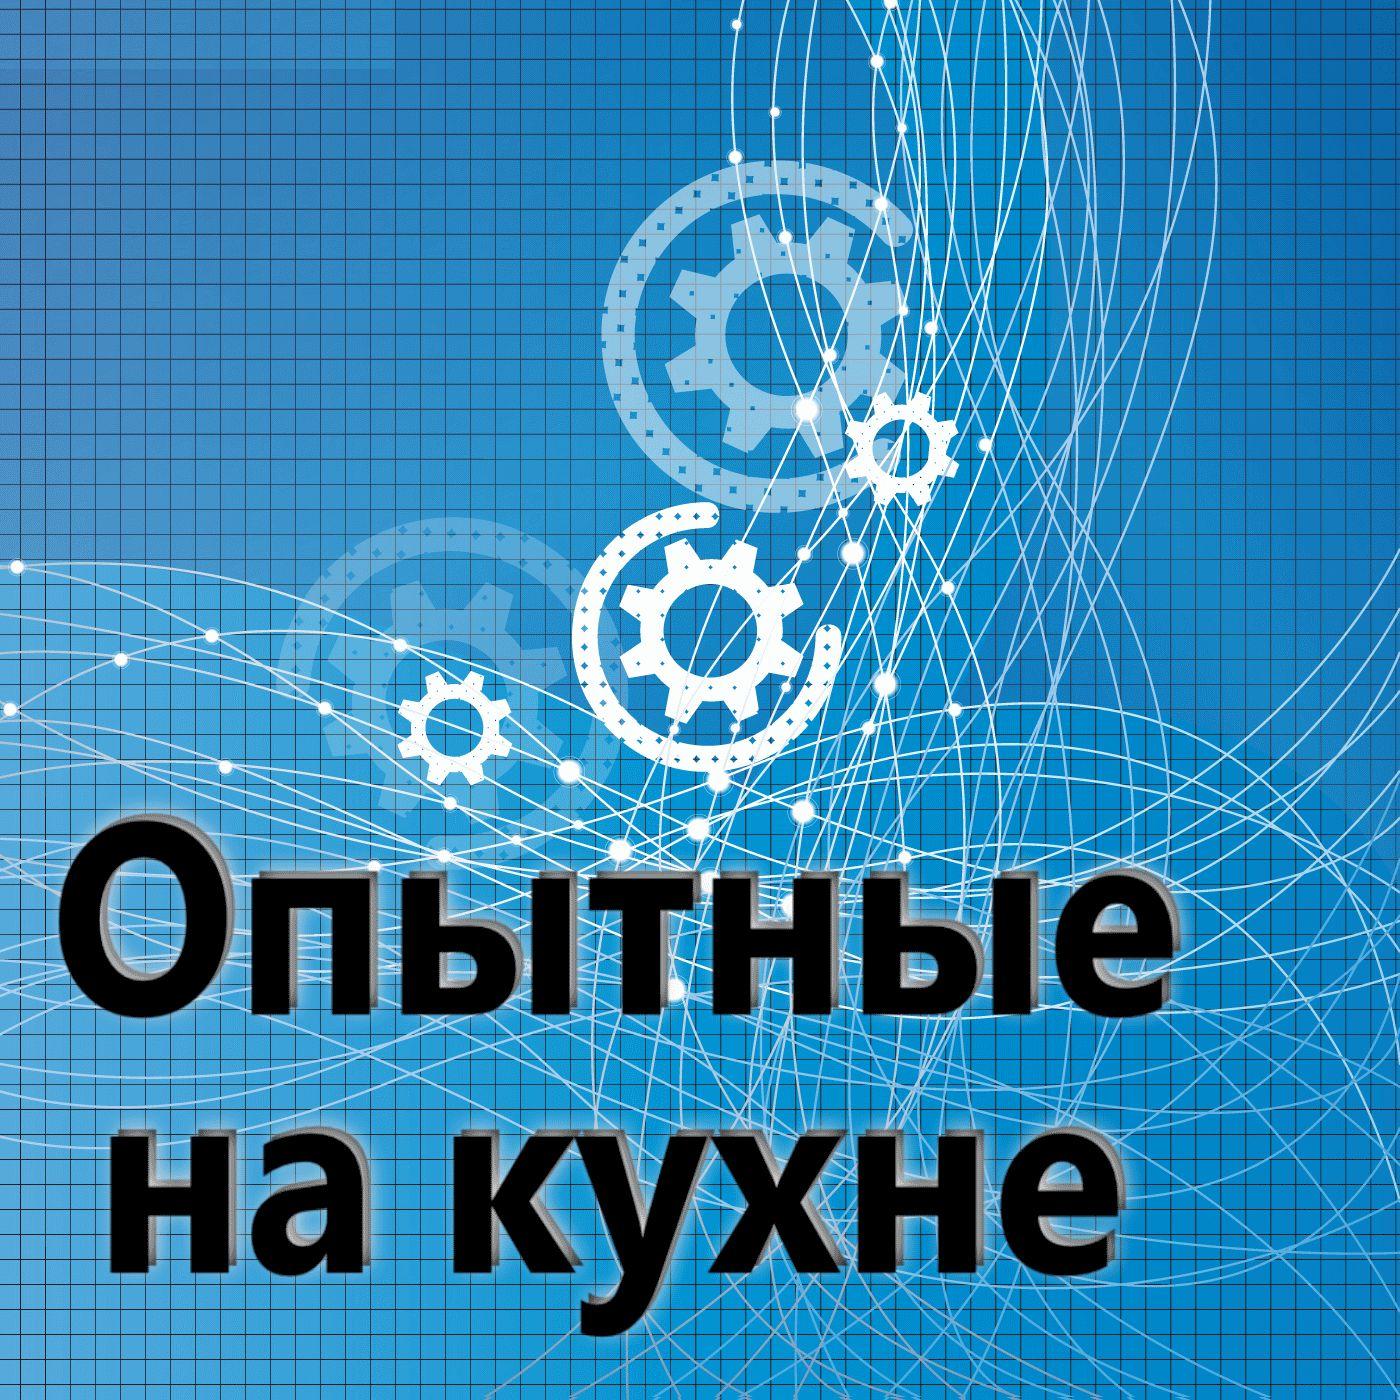 Евгений Плешивцев Опытные на кухне №077 https www butik ru